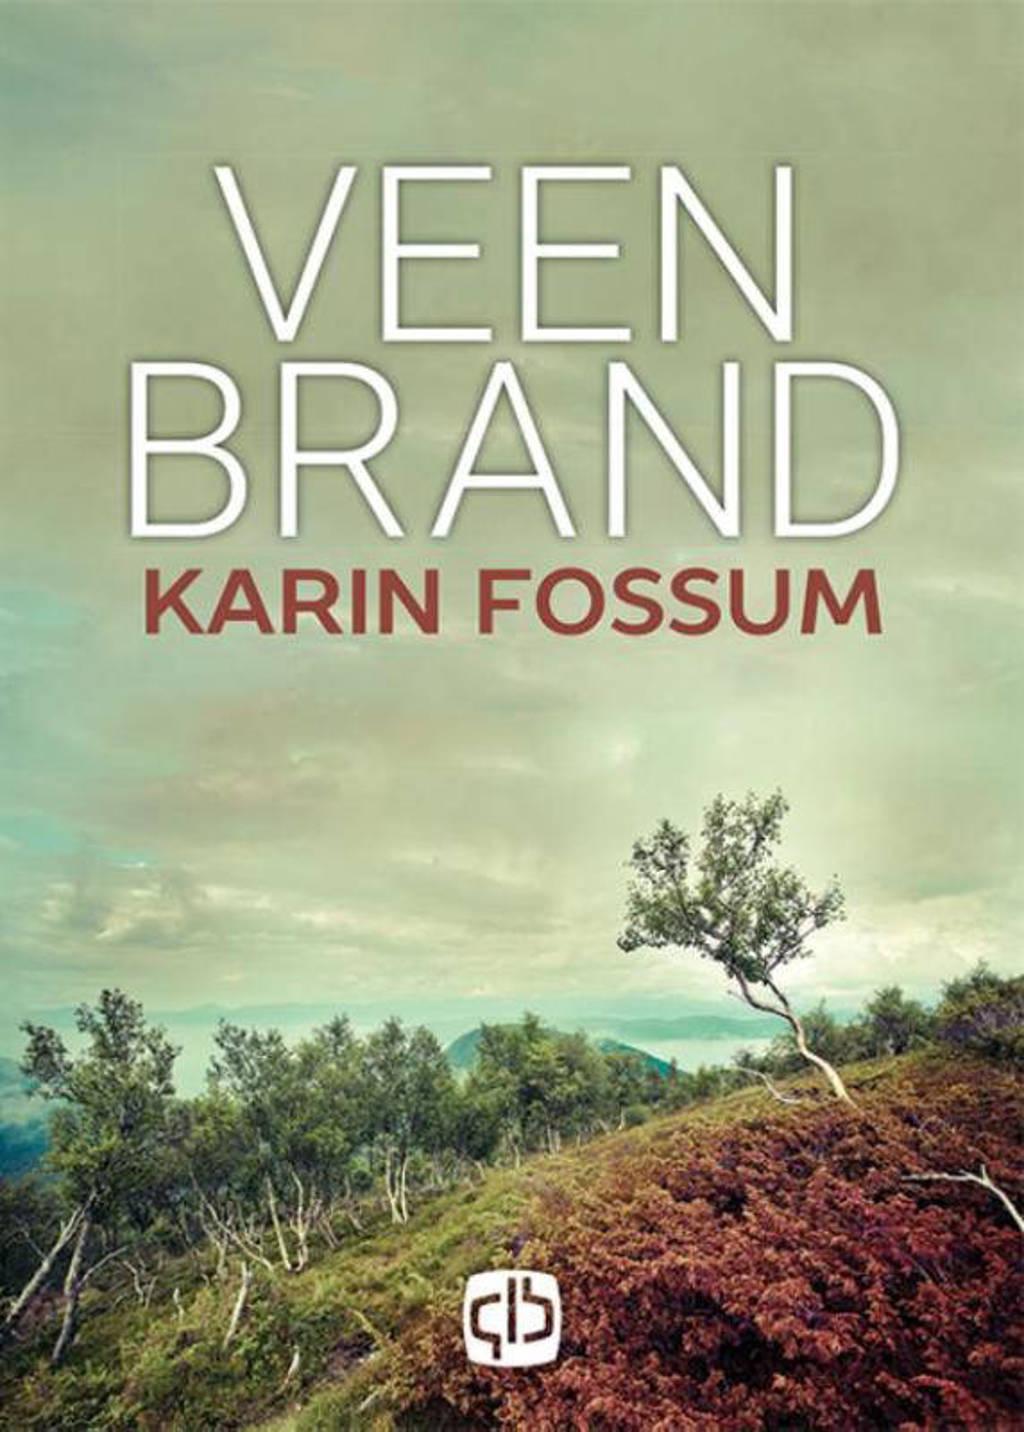 Veenbrand - Karin Fossum